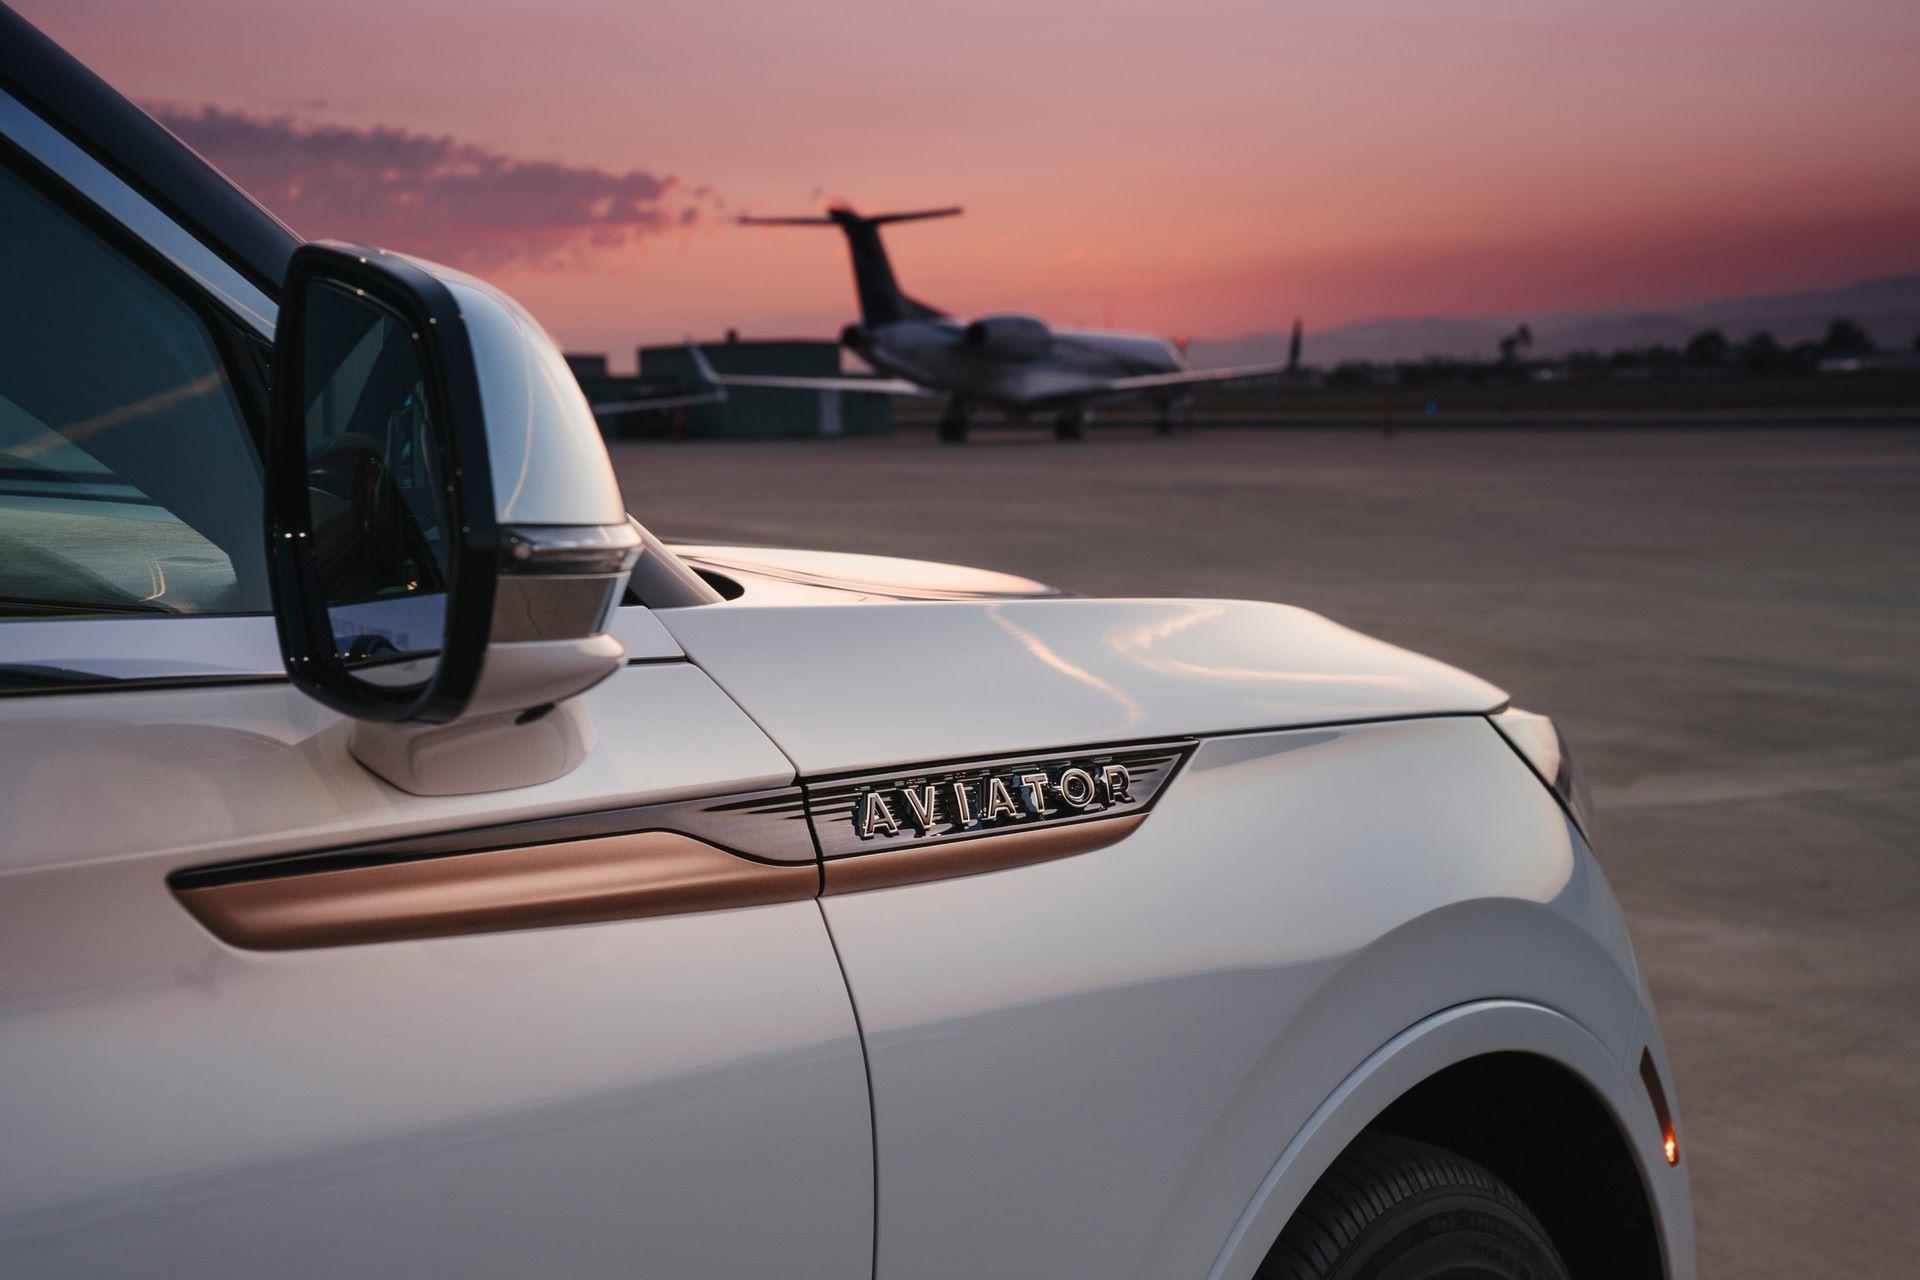 Lincoln-Aviator-Shinola-Concept-14